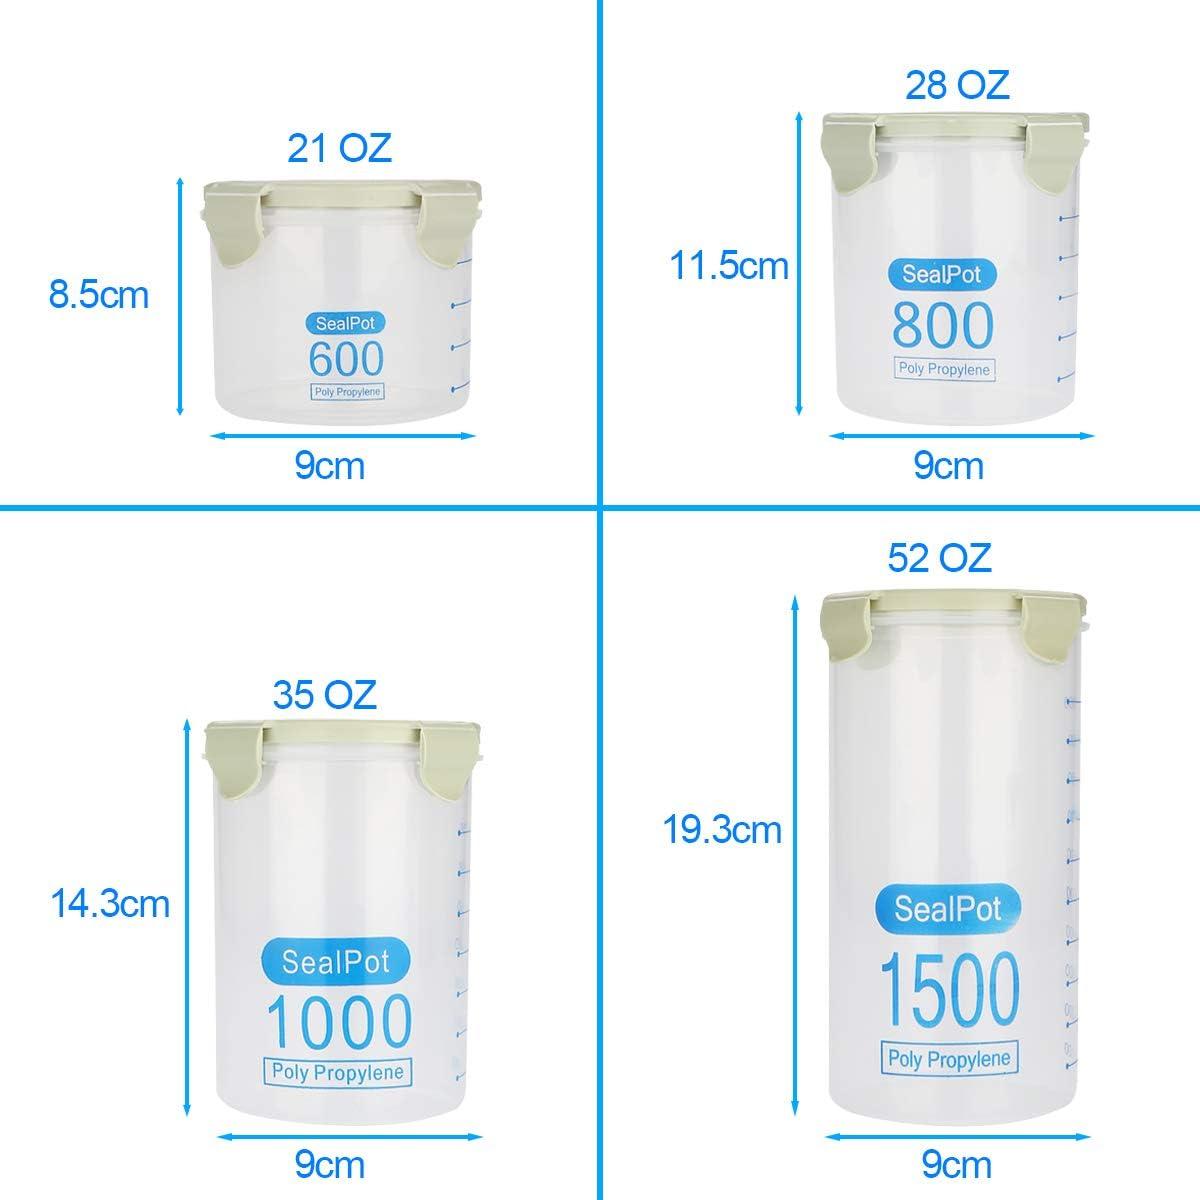 Aitsite 4PCS Tarro de Vidrio de Almacenamiento Juego de Recipientes Herm/éticos Tarros de Cristal con Tapa Tarro de Granos Transparente Contenedores de Alimentos Cristal sin BPA 2*1000ml+2*1800m